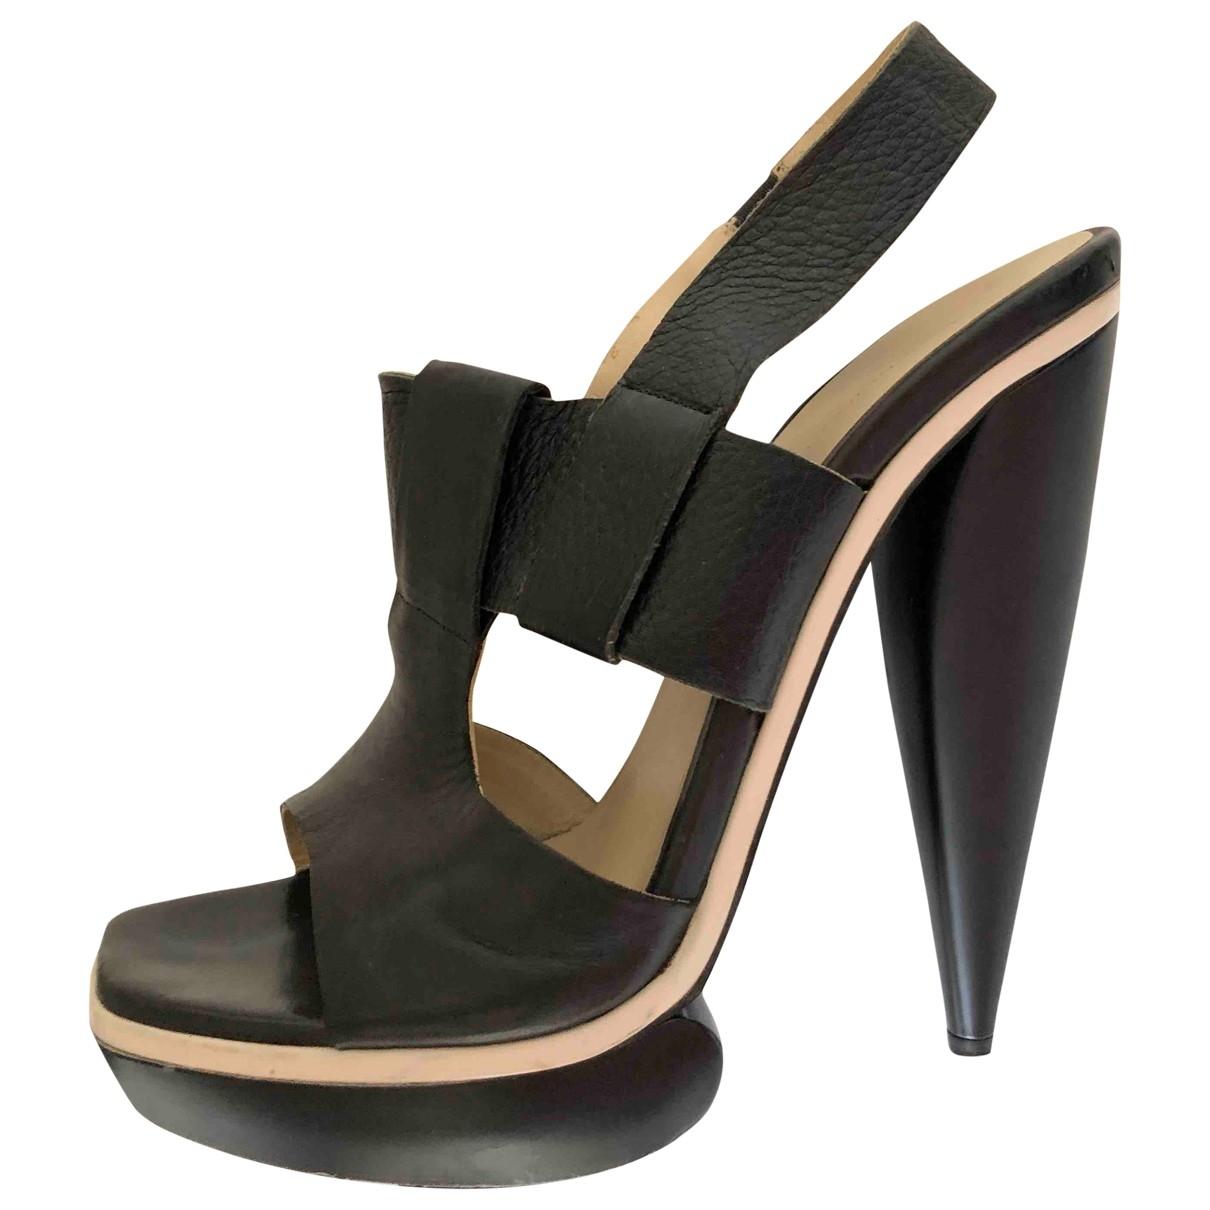 Balenciaga \N Black Leather Sandals for Women 38.5 EU